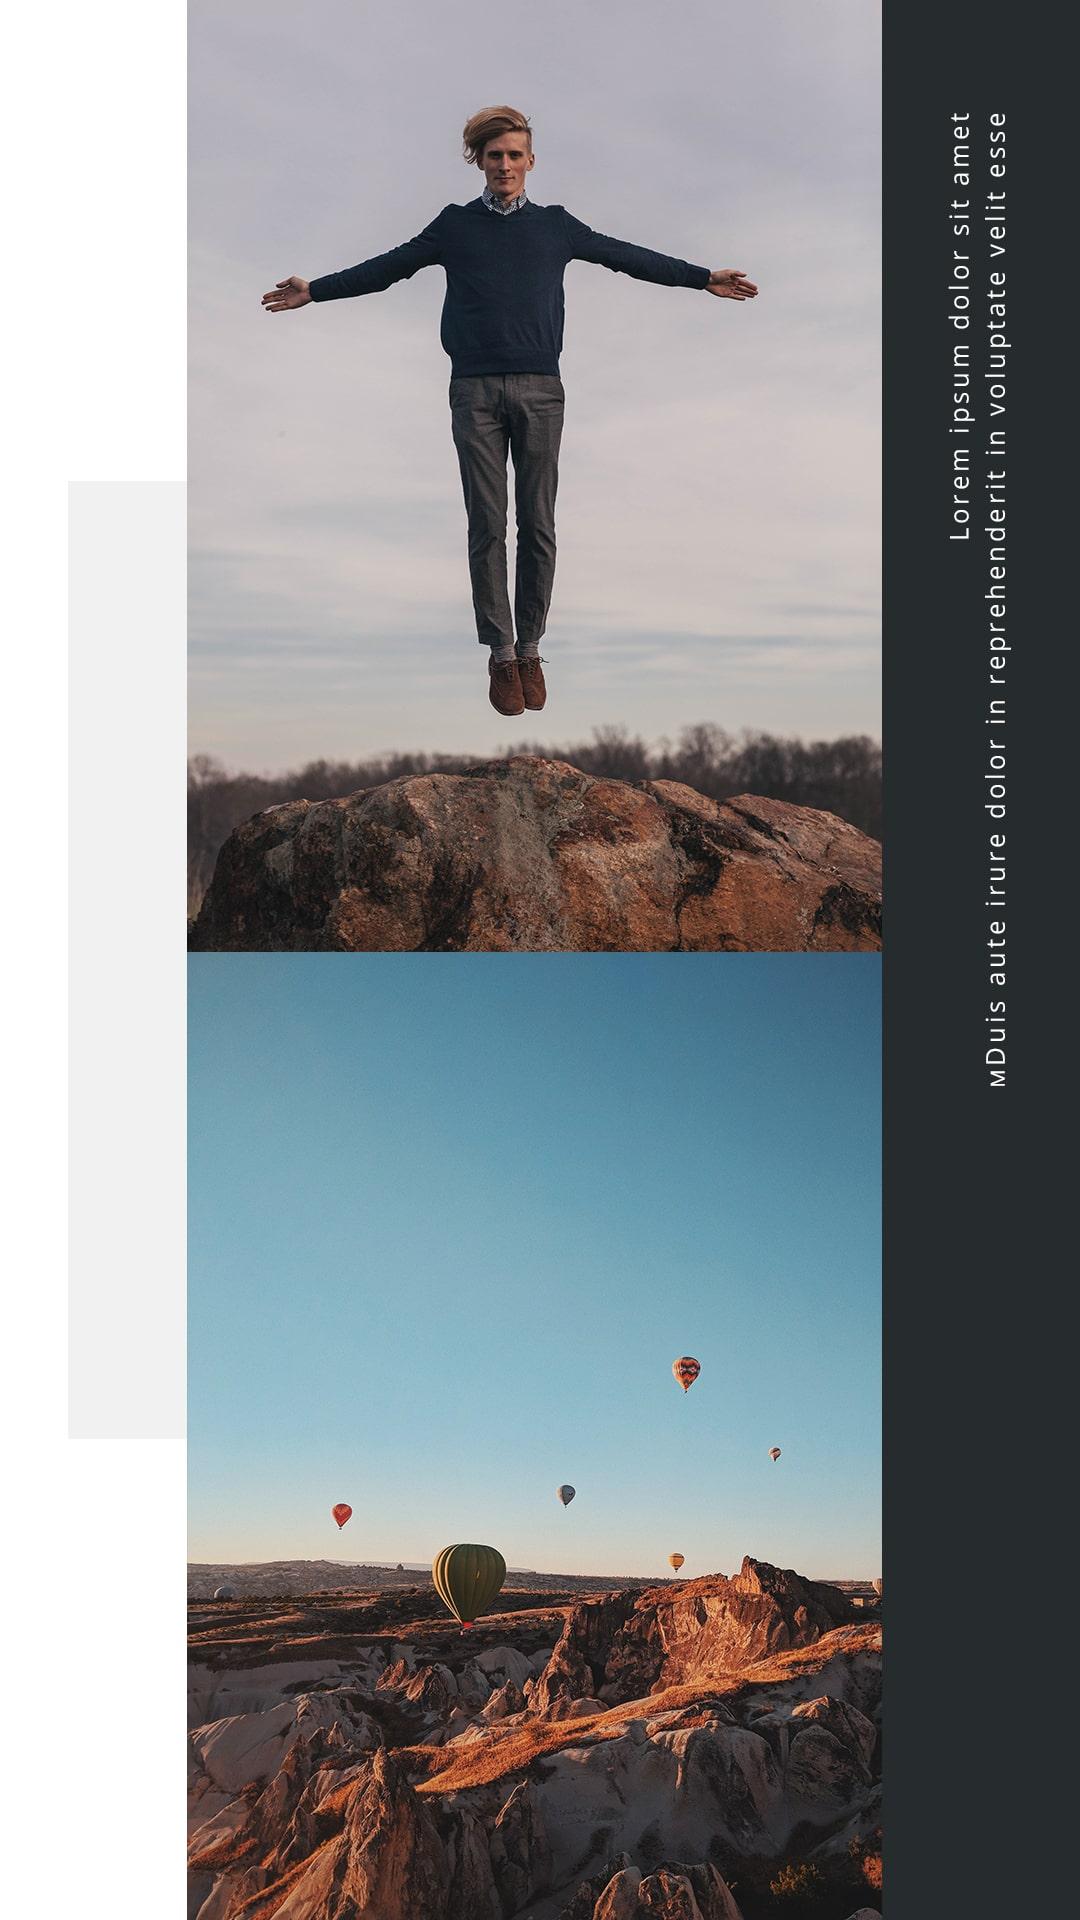 Travel Instagram Templates Bundle: 12 posts, 12 stories + BONUS 14 Instagram Highlight icons - $18 - 6 min 3